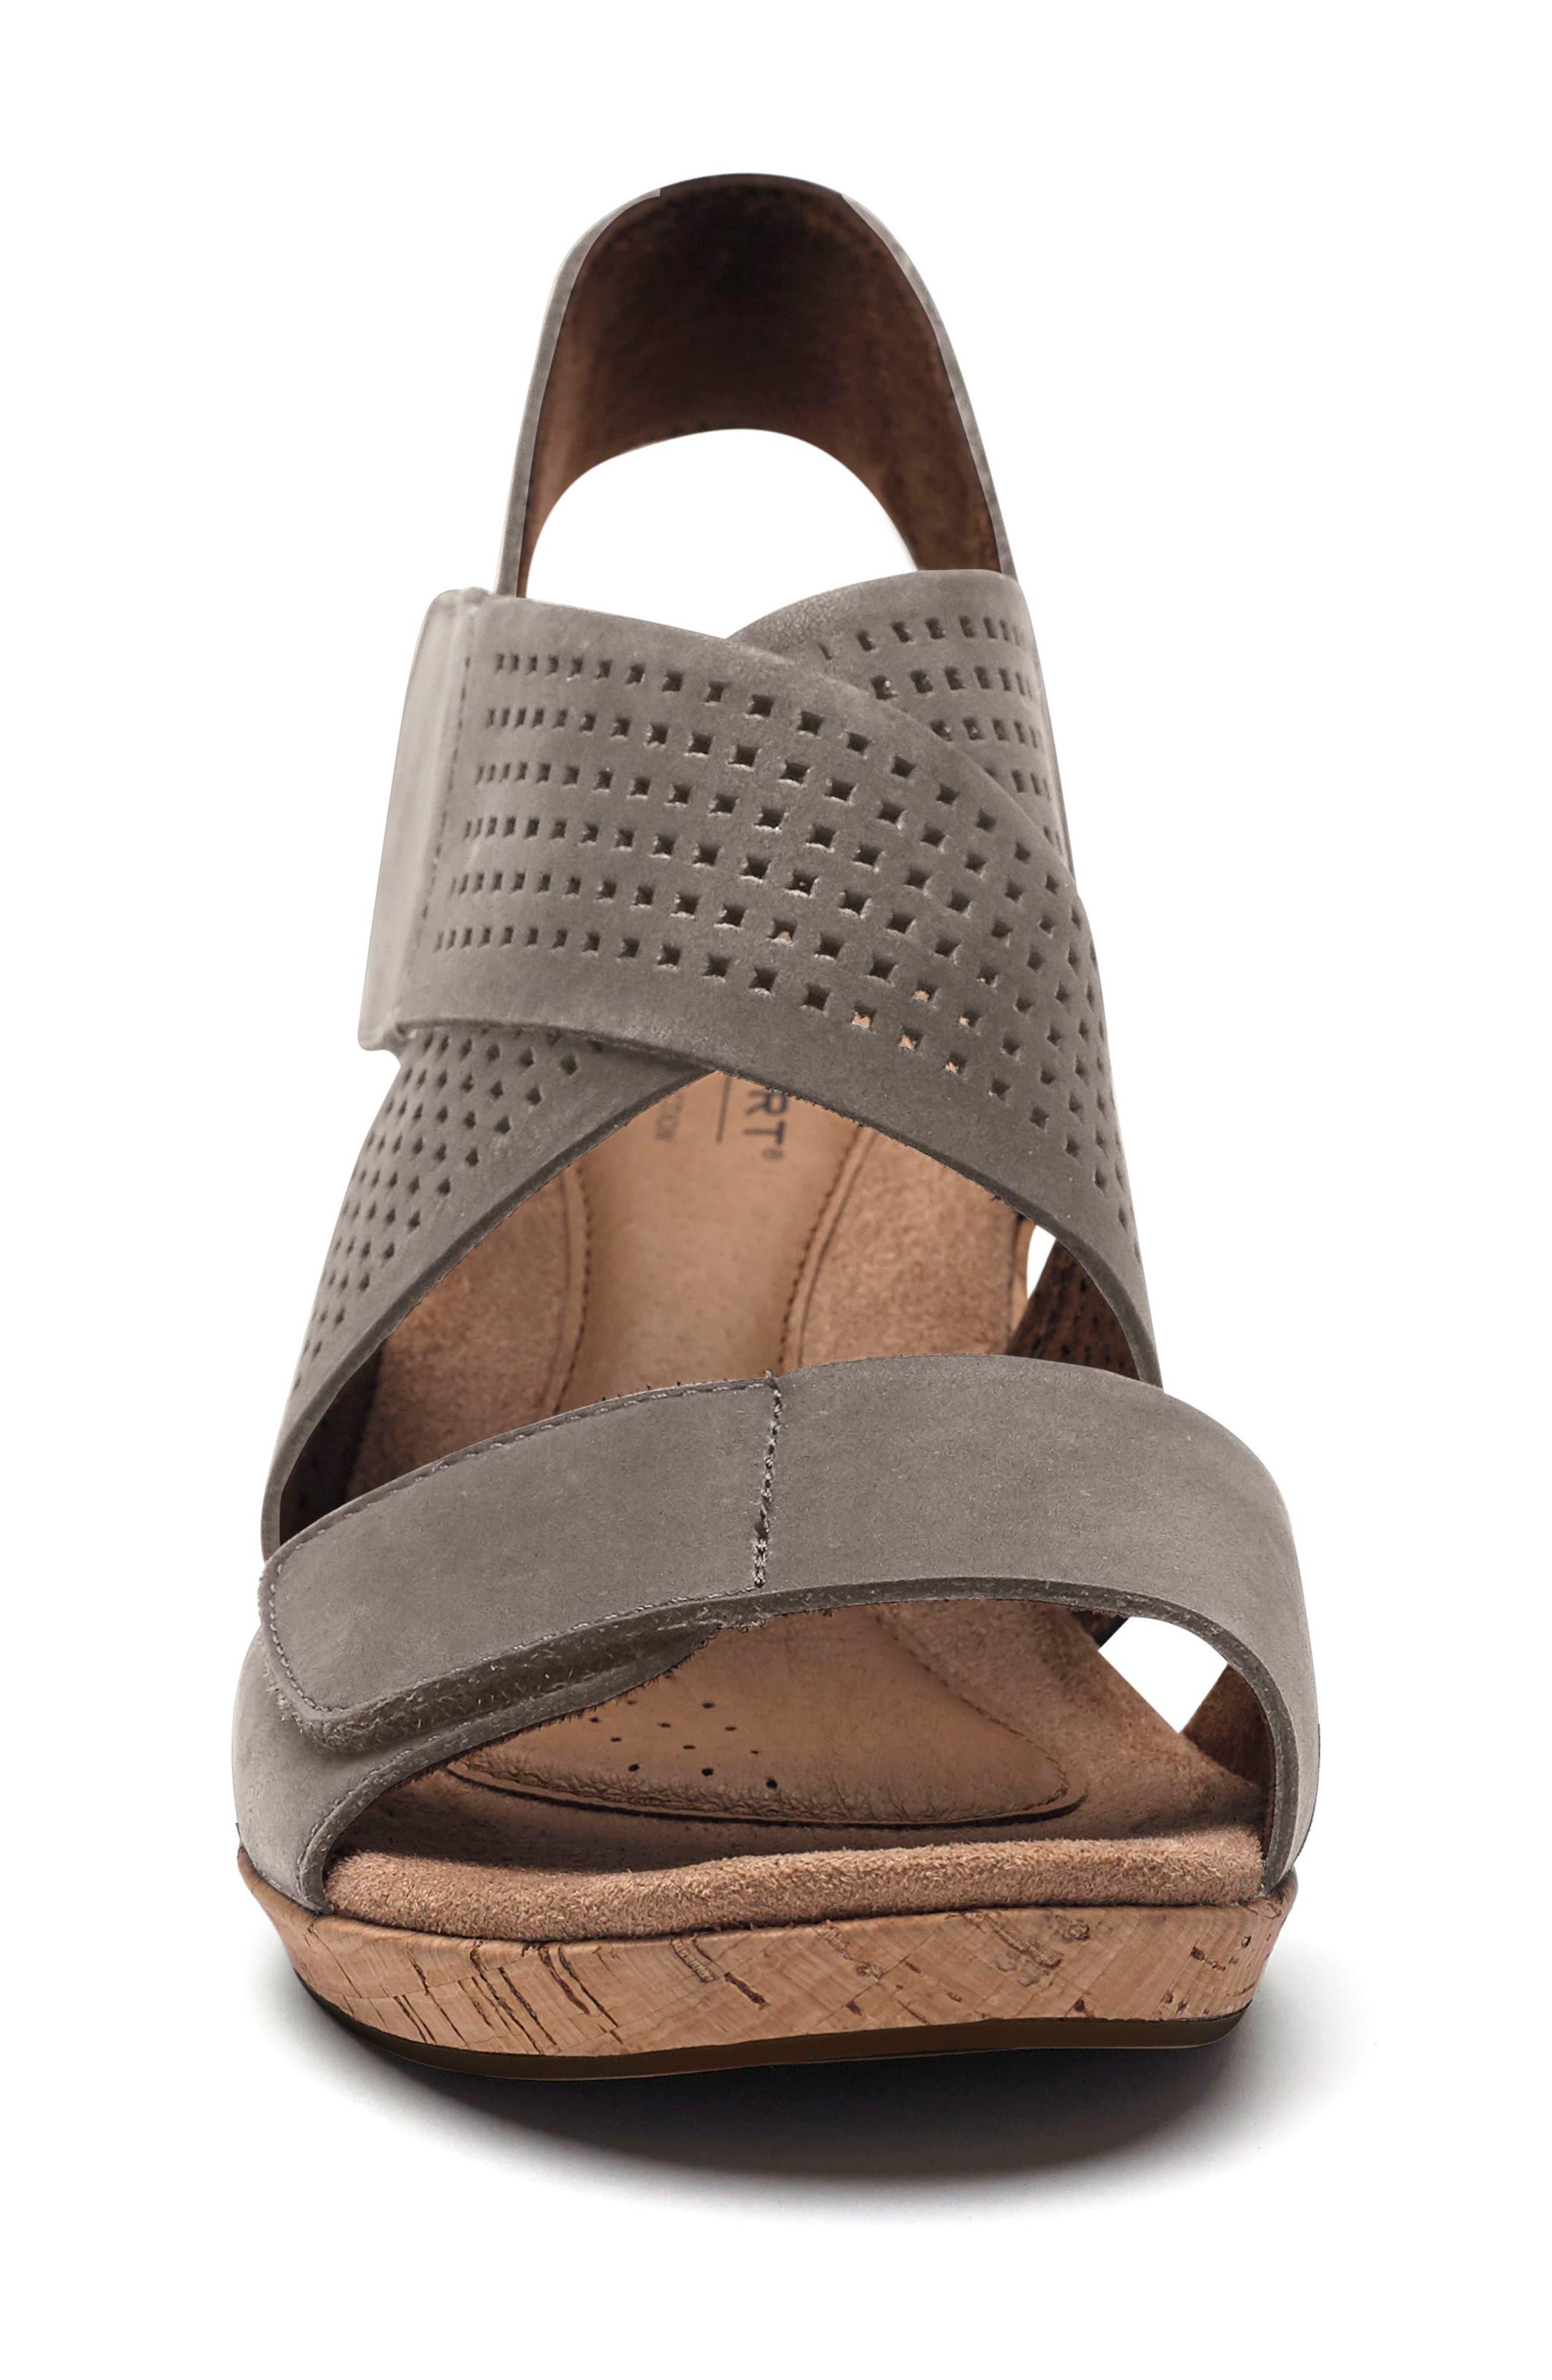 Janna Cross Strap Wedge Sandal,                             Alternate thumbnail 18, color,